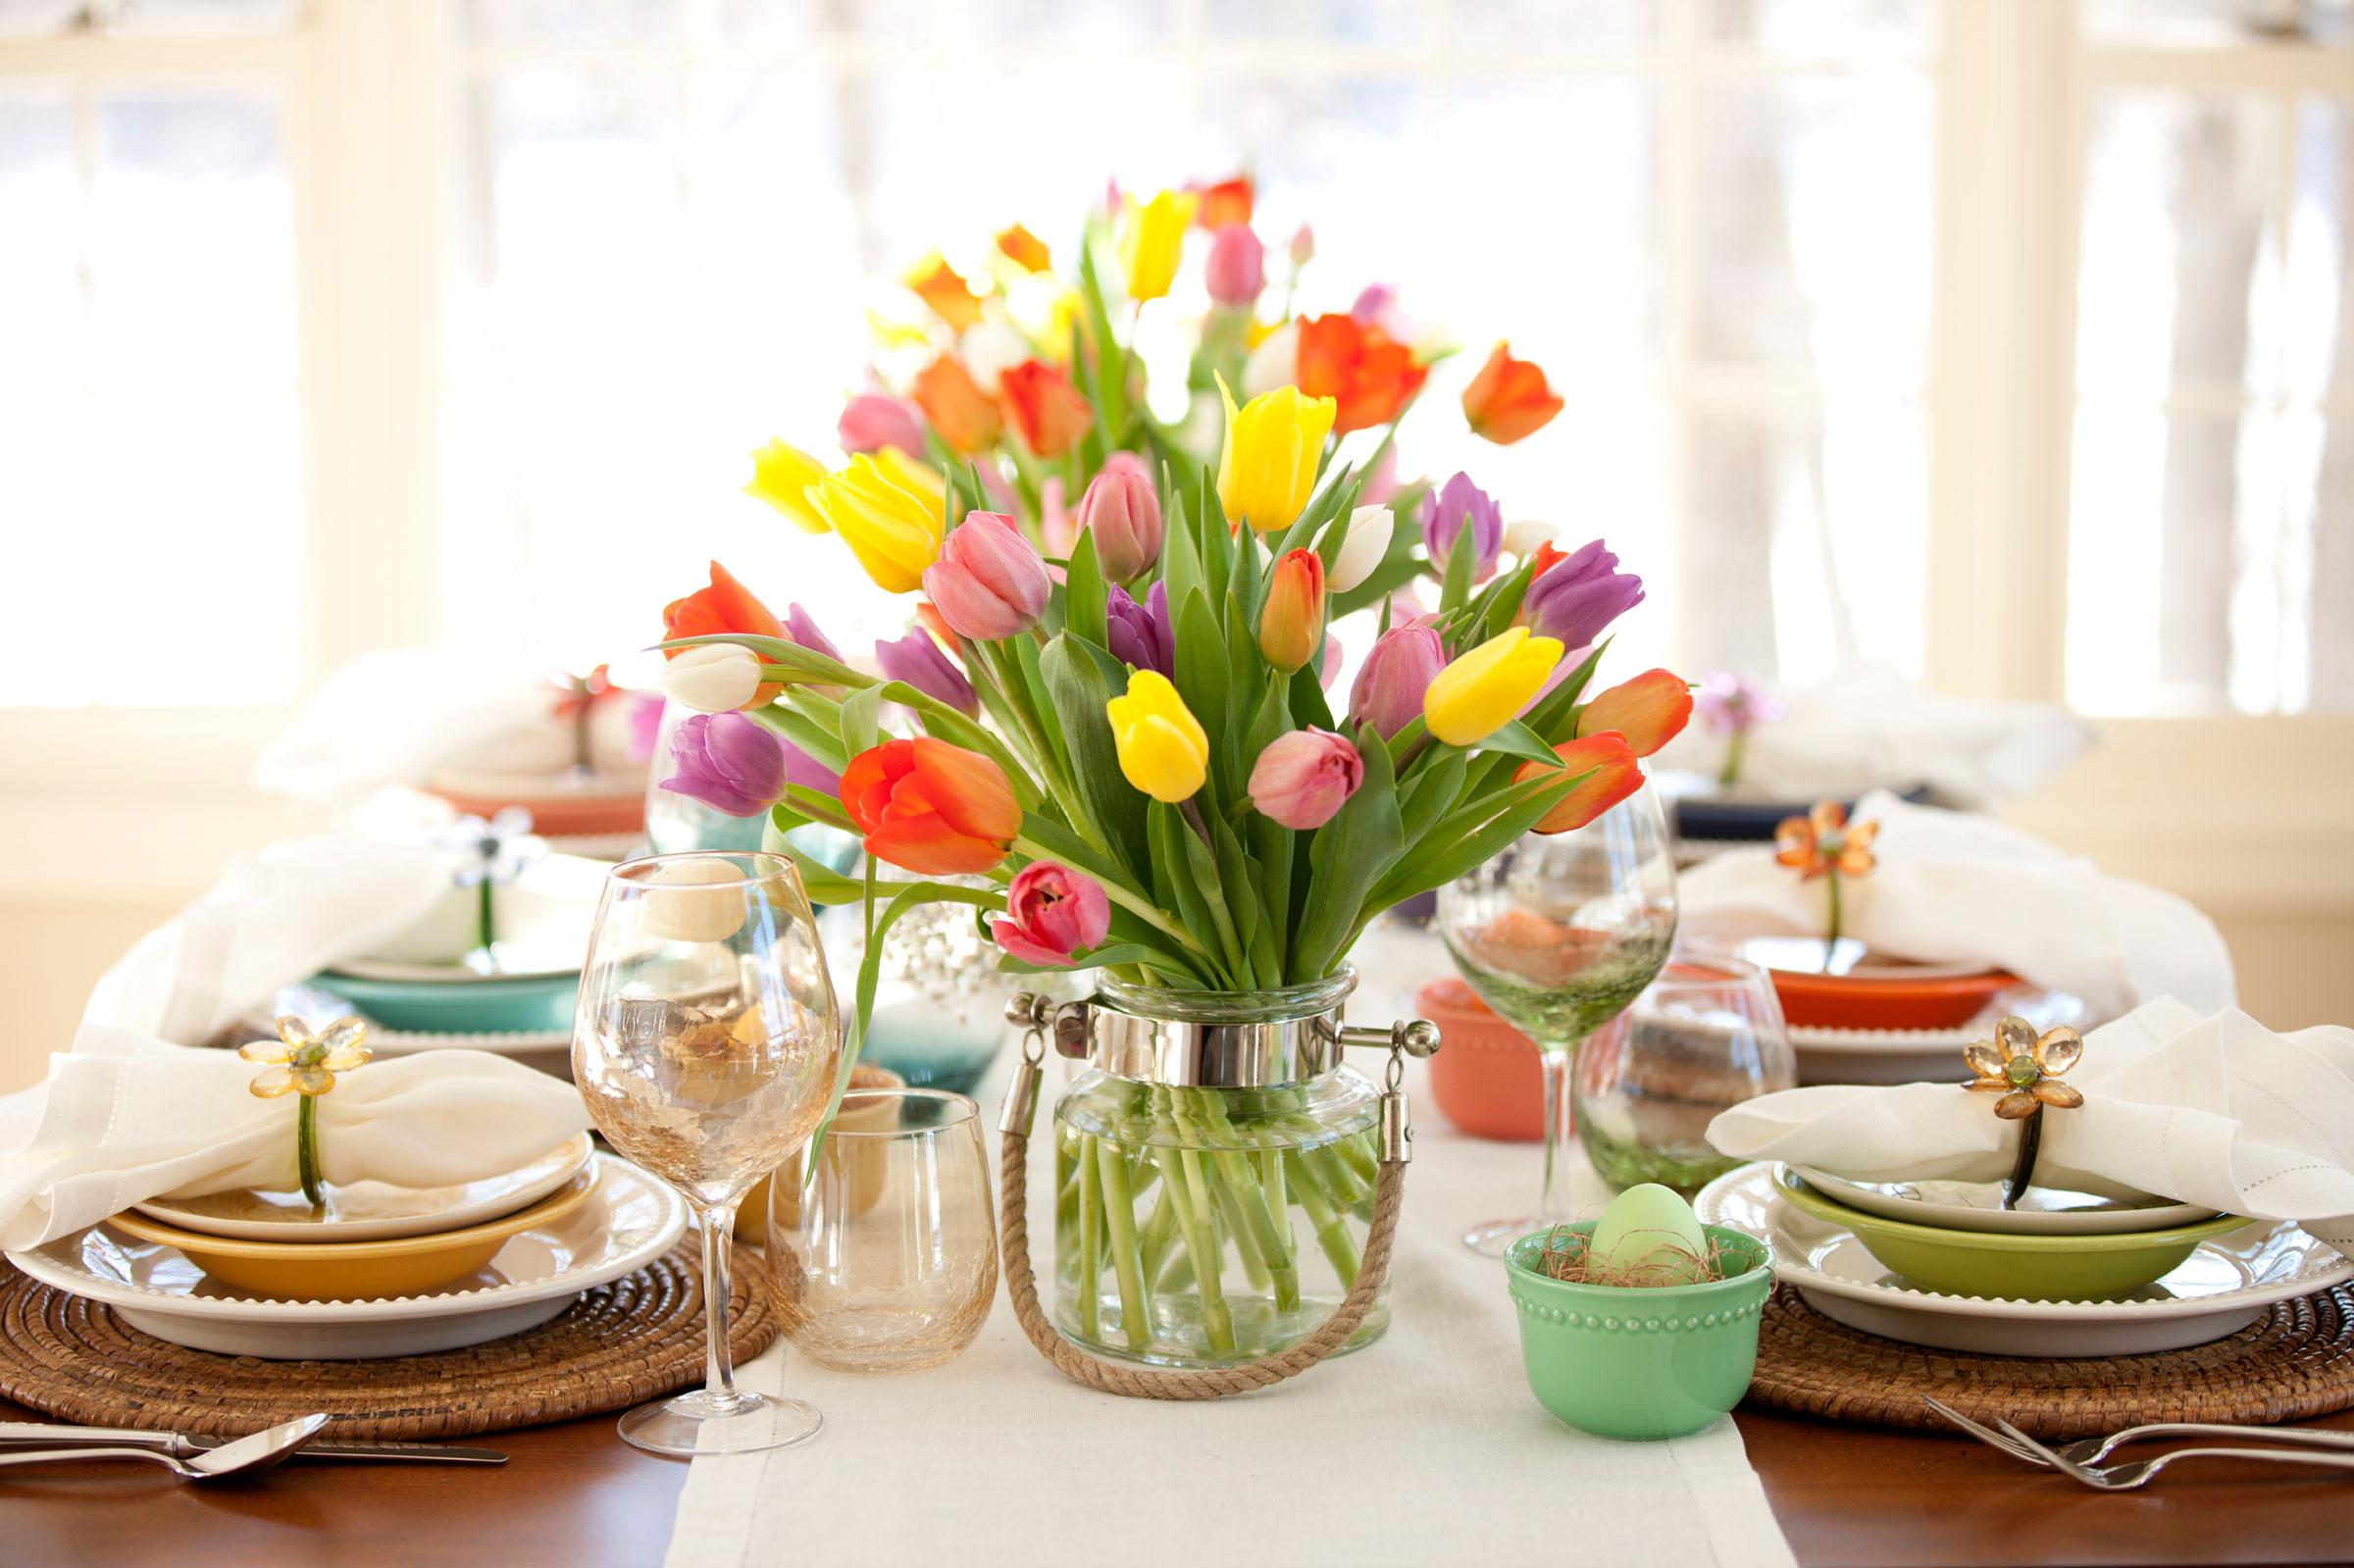 11-13-things-florist-glass-vase